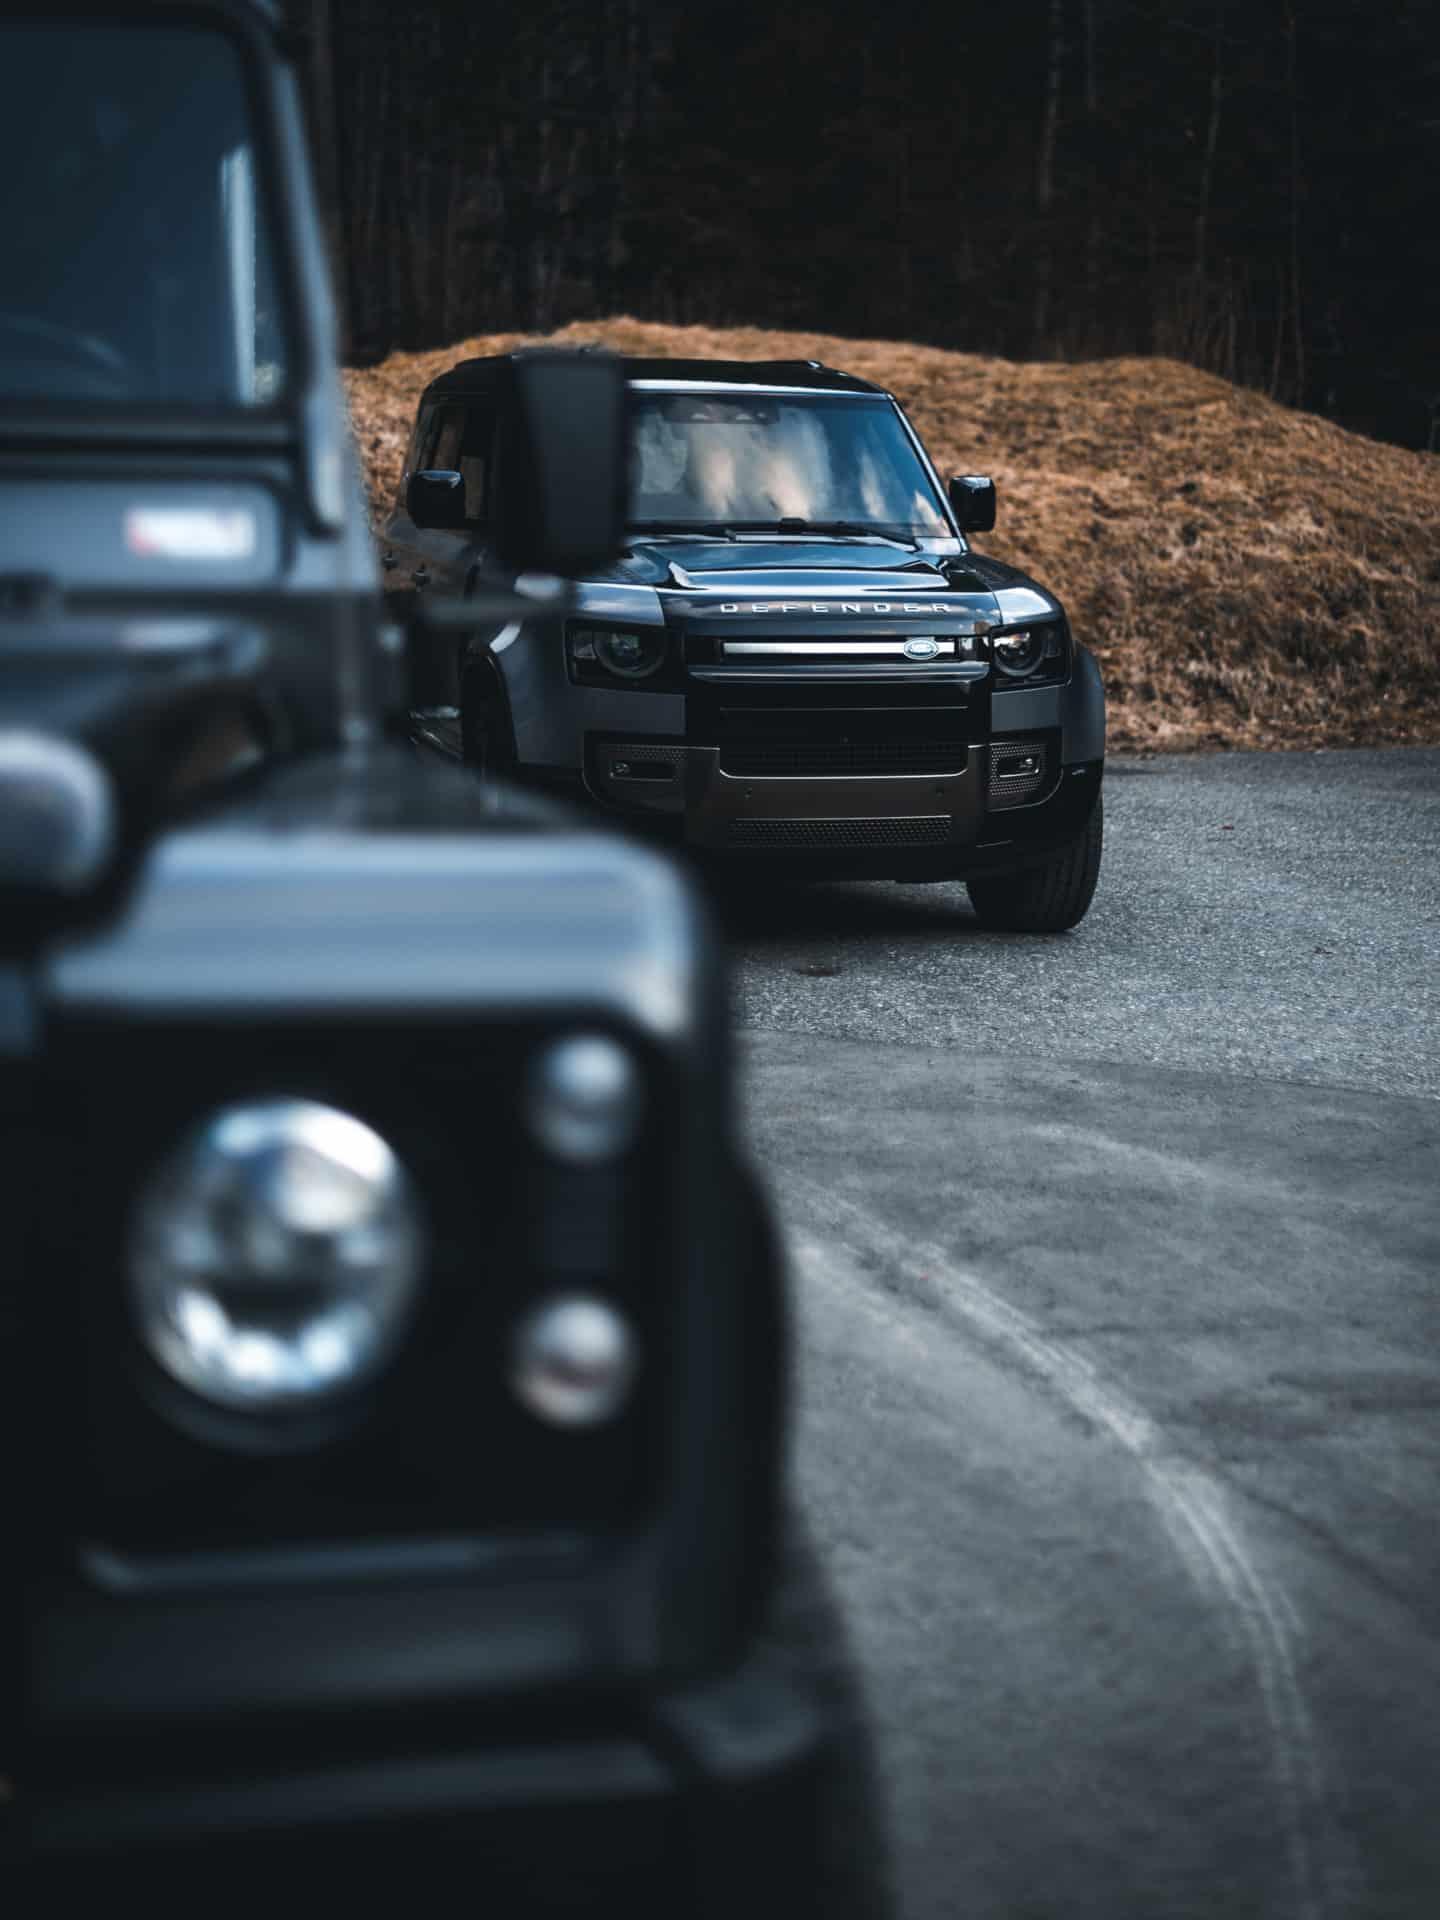 Land Rover Defender 2020 x Niels Oberson (2)